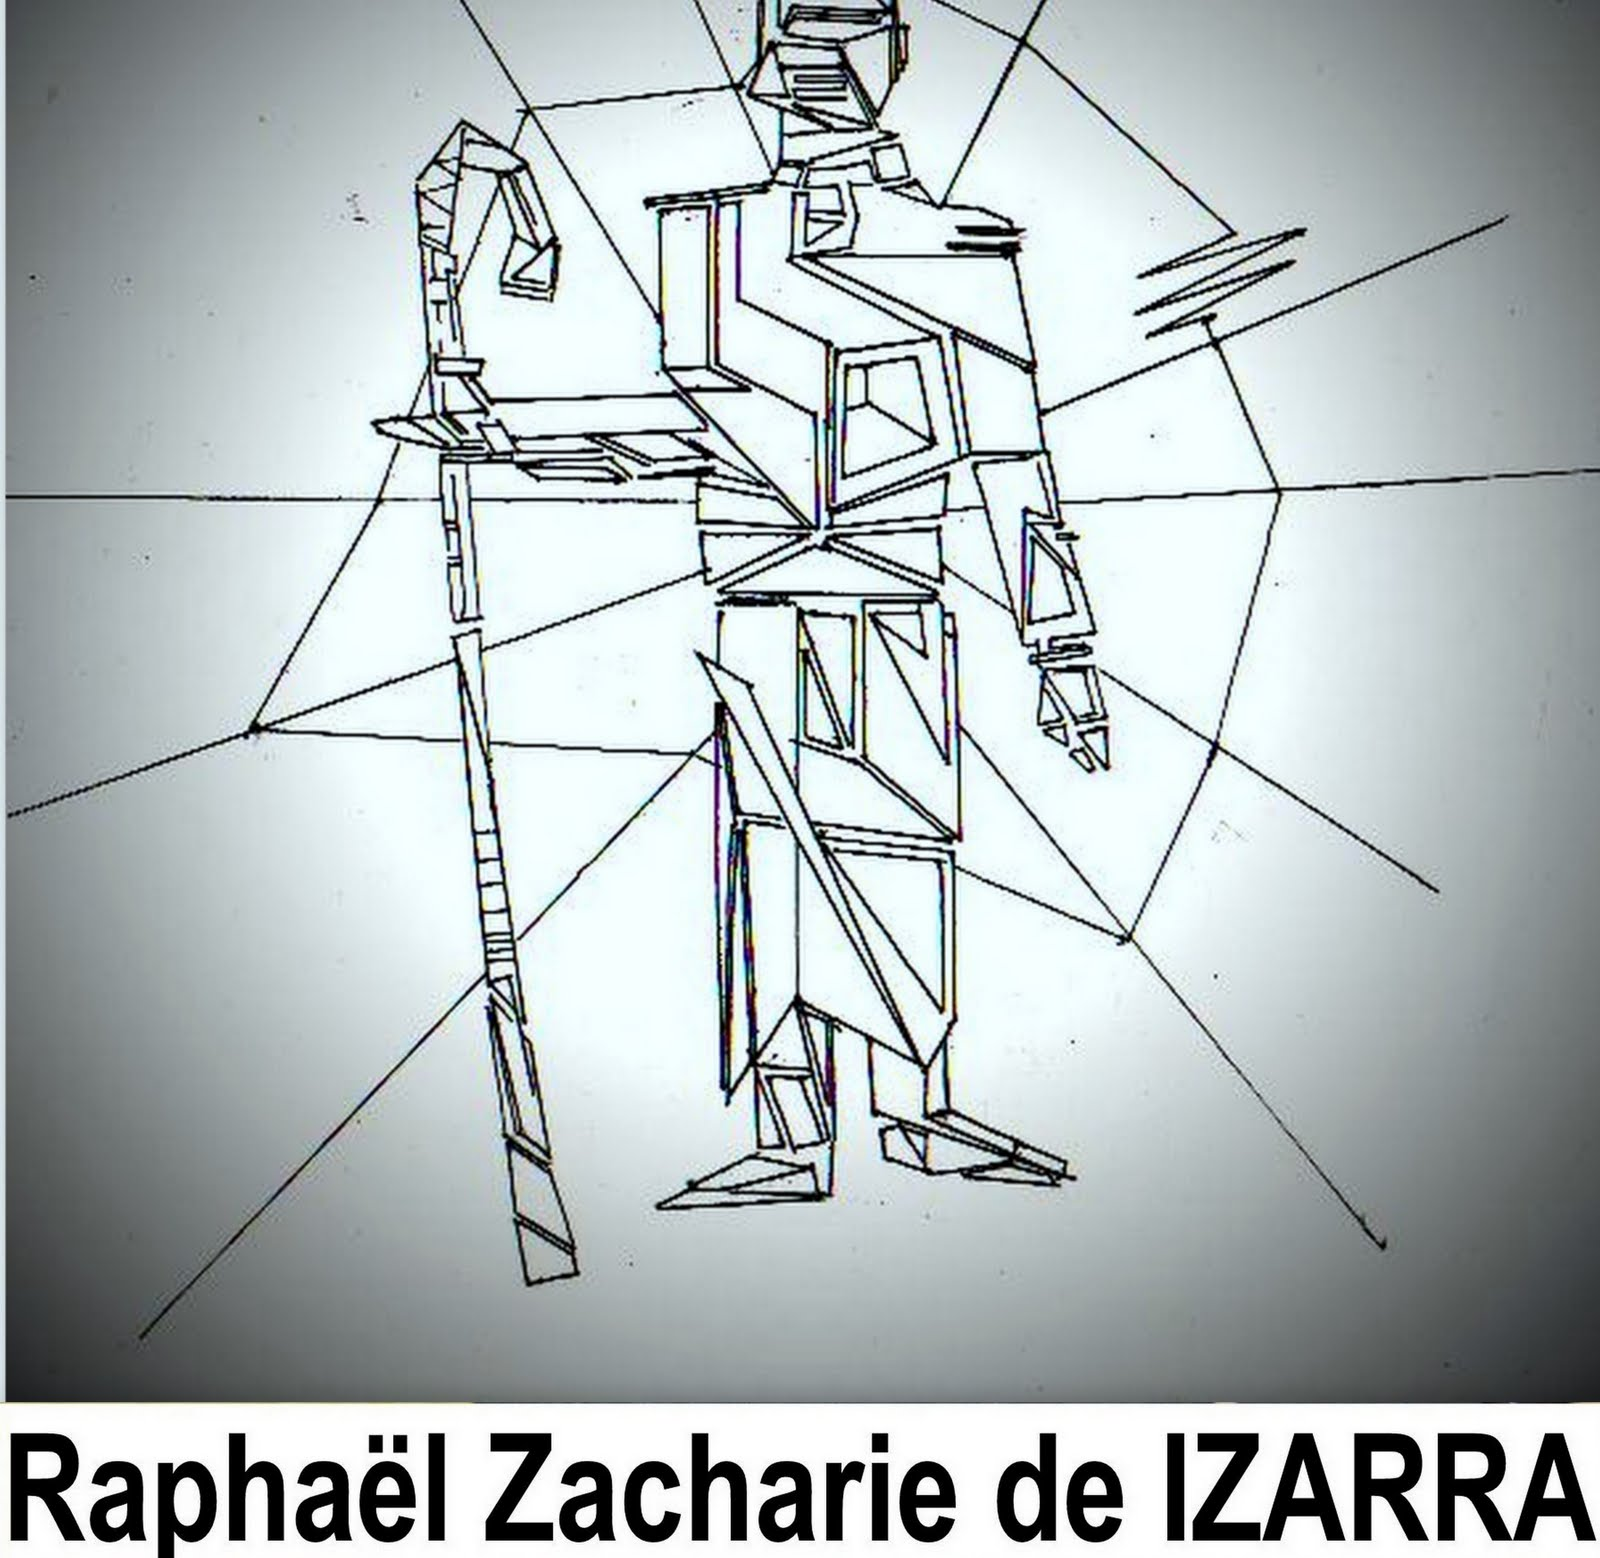 msd btm install axxess wiring diagram raphaël zacharie de izarra ovni warloy baillon ufo: - warloy-baillon ...